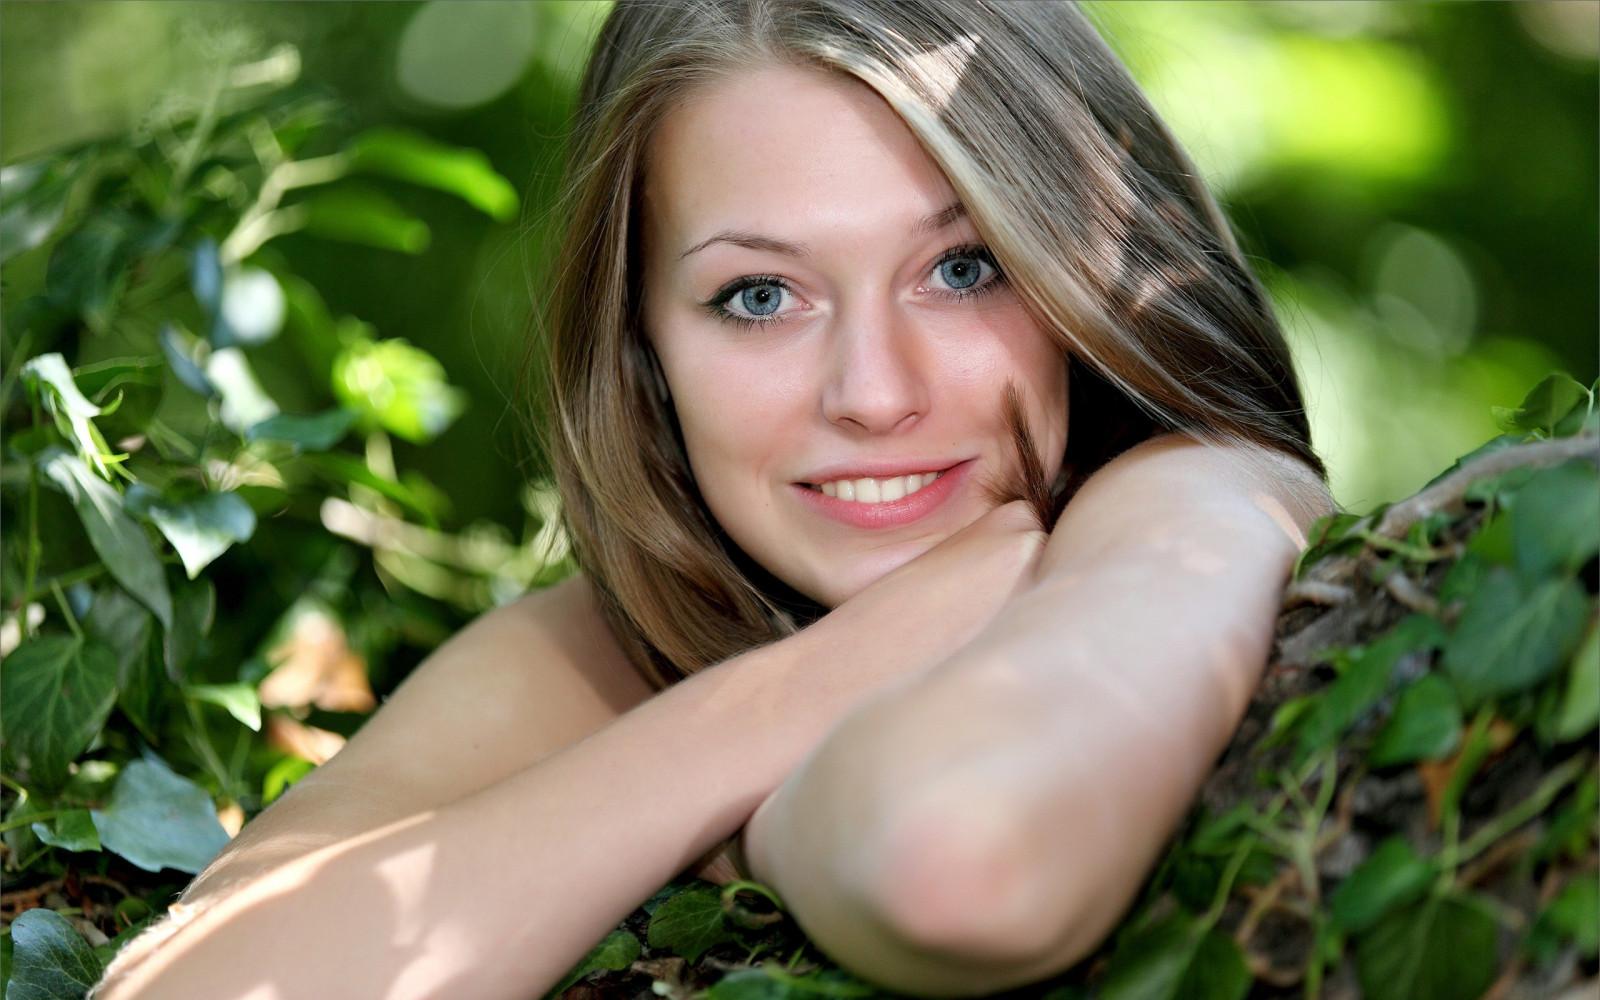 Wallpaper Face Model Blonde Long Hair Blue Eyes: Wallpaper : Face, Sunlight, Women, Model, Blonde, Long